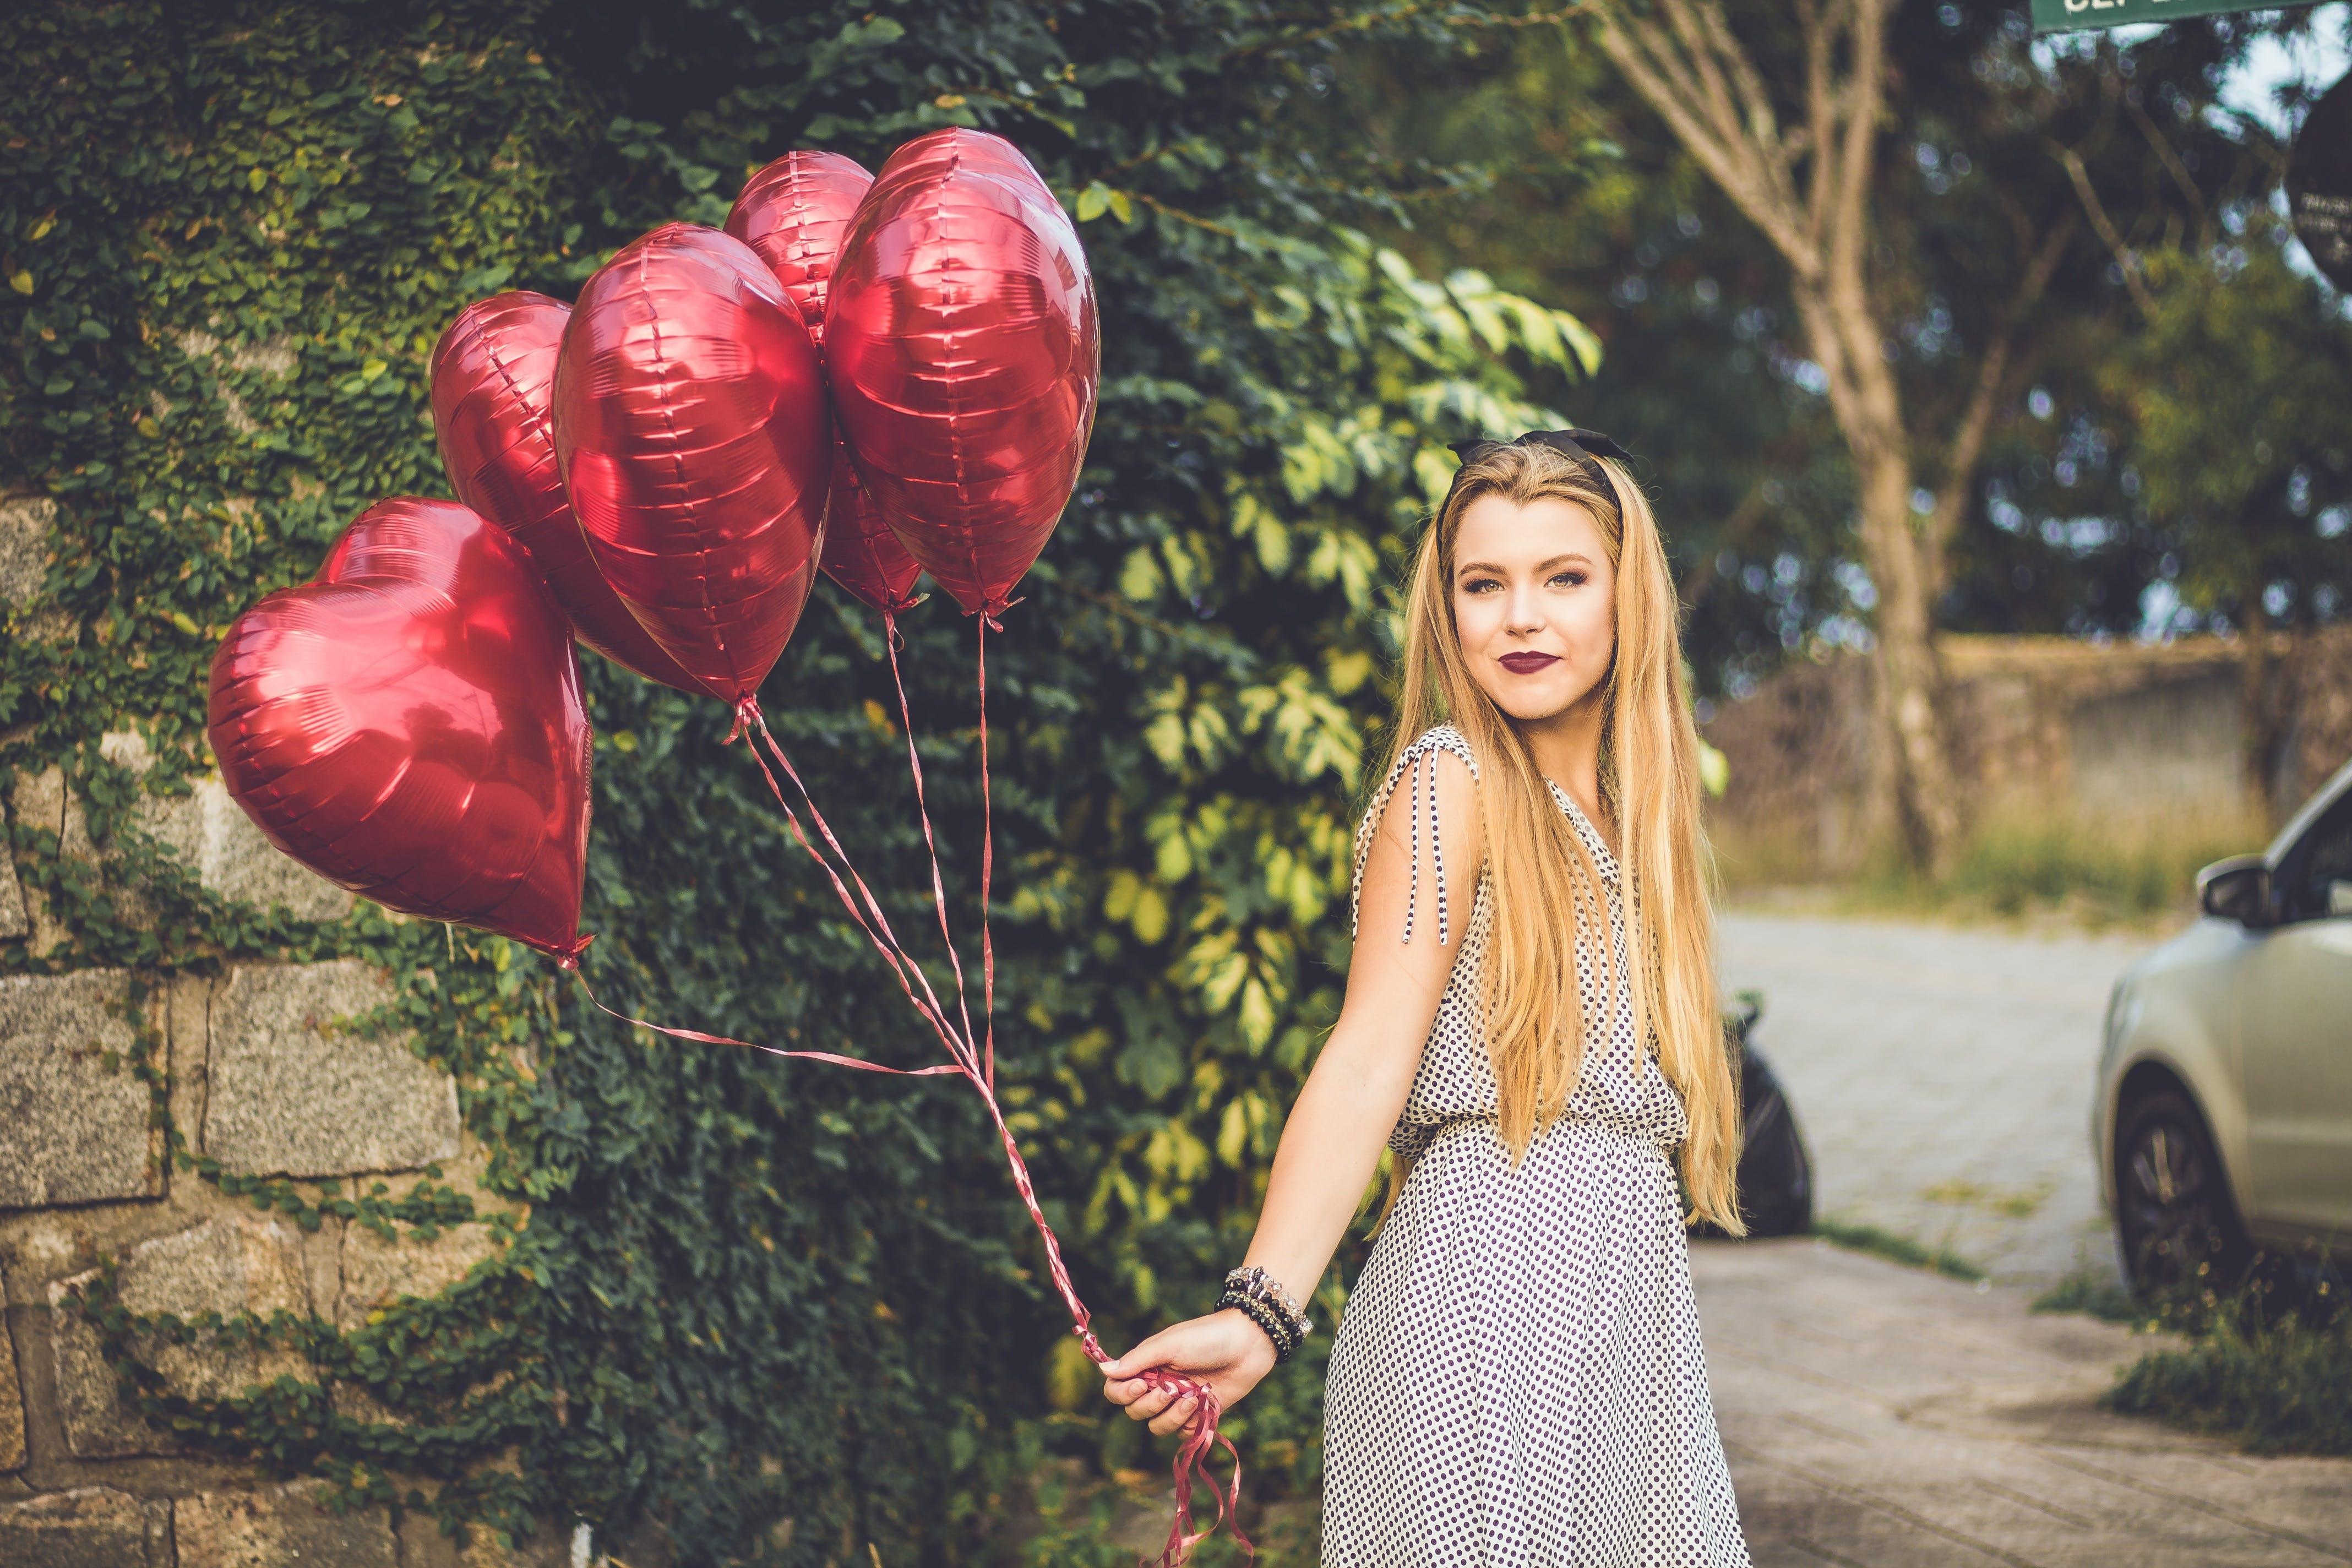 adult, balloons, beautiful